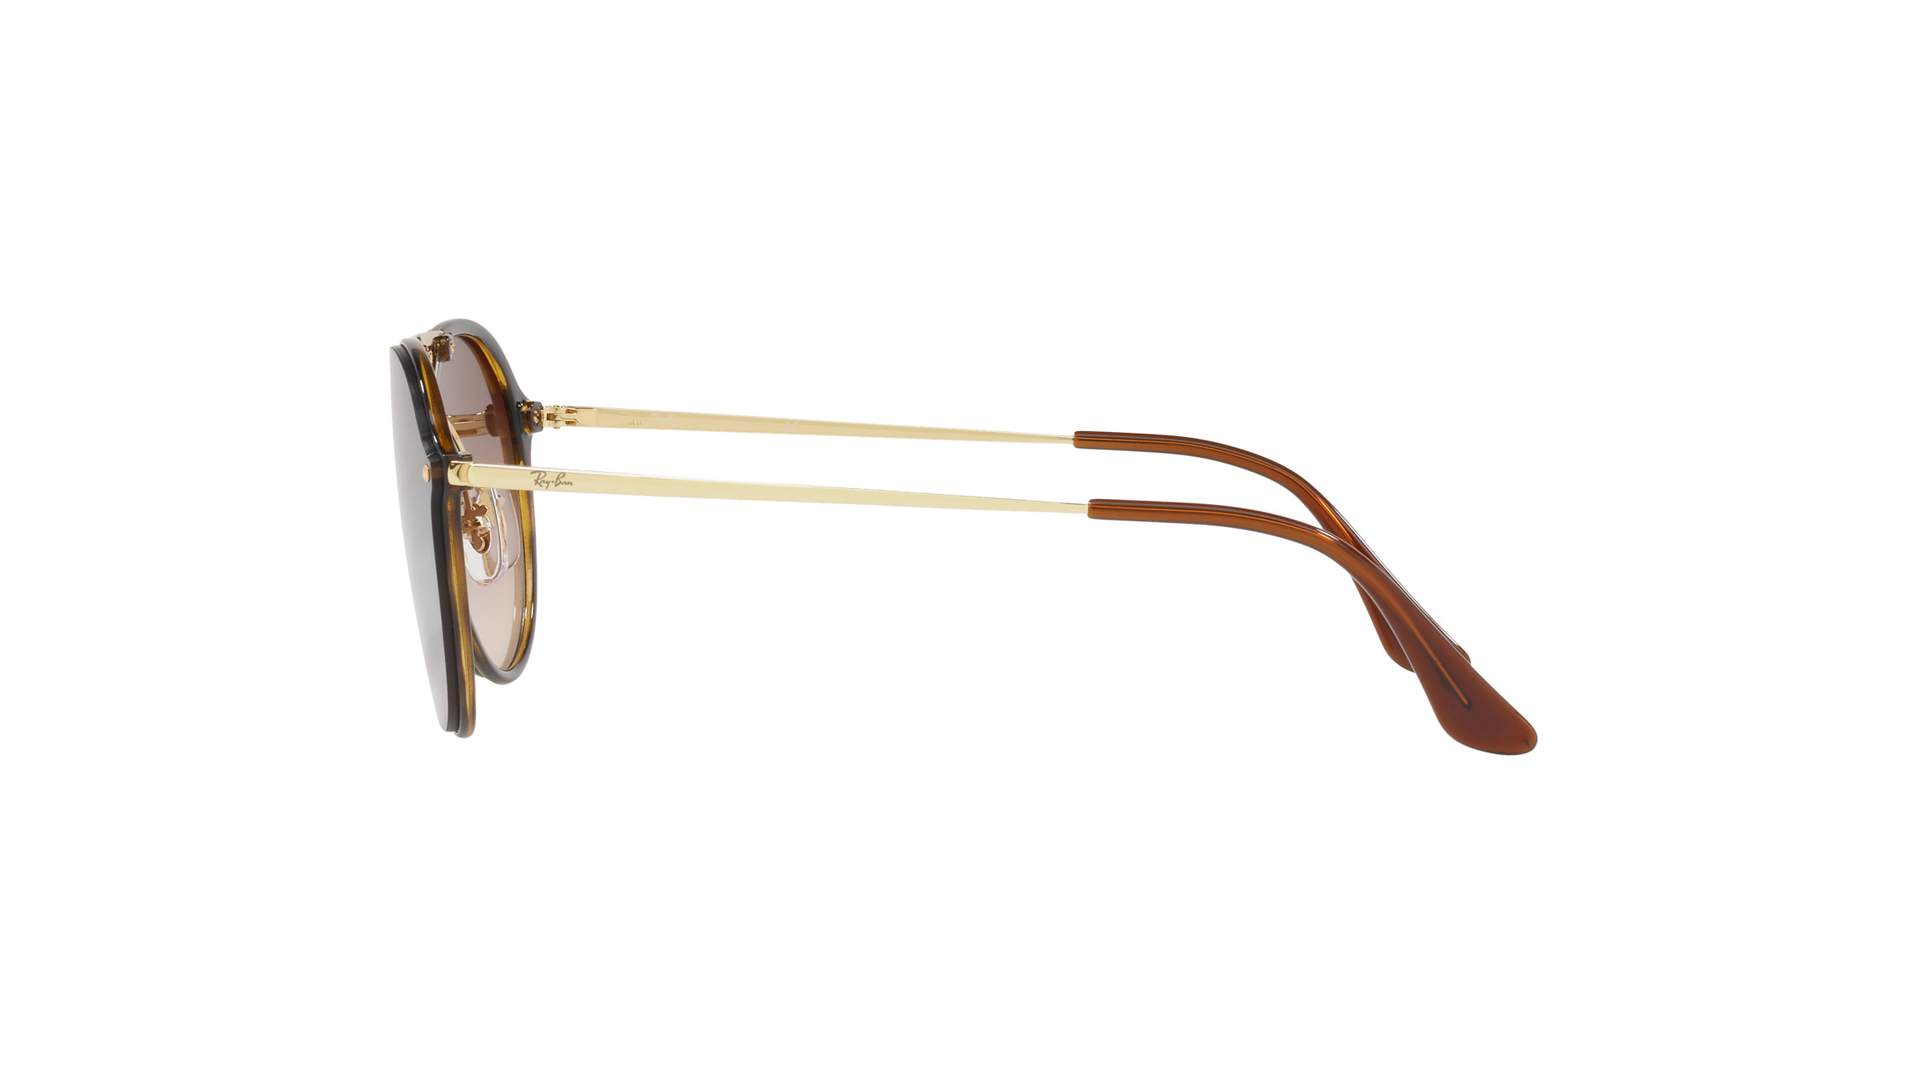 Sunglasses Ray-Ban Blaze Double Bridge Gold RB4292N 710 13 62-14 Large  Gradient ee86c9f03a